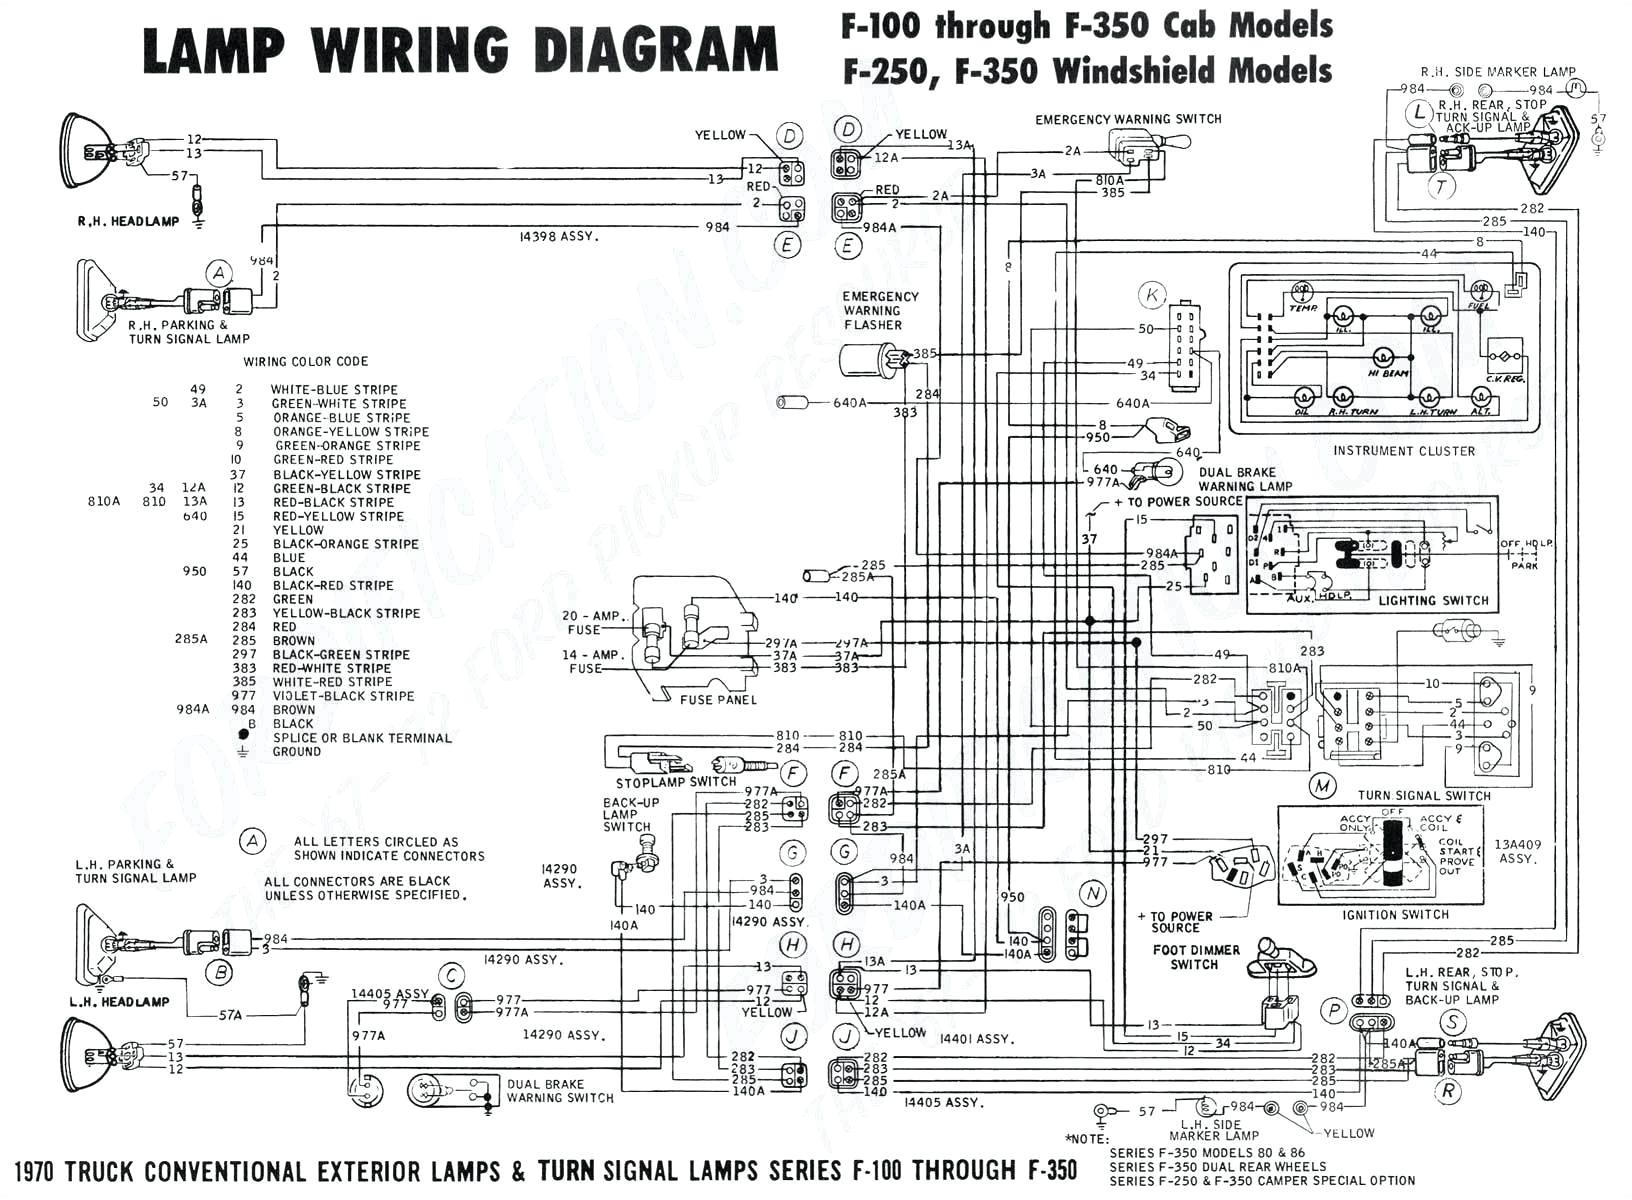 ford super duty wiring diagram wiring diagram database ford f 250 4x4 wiring